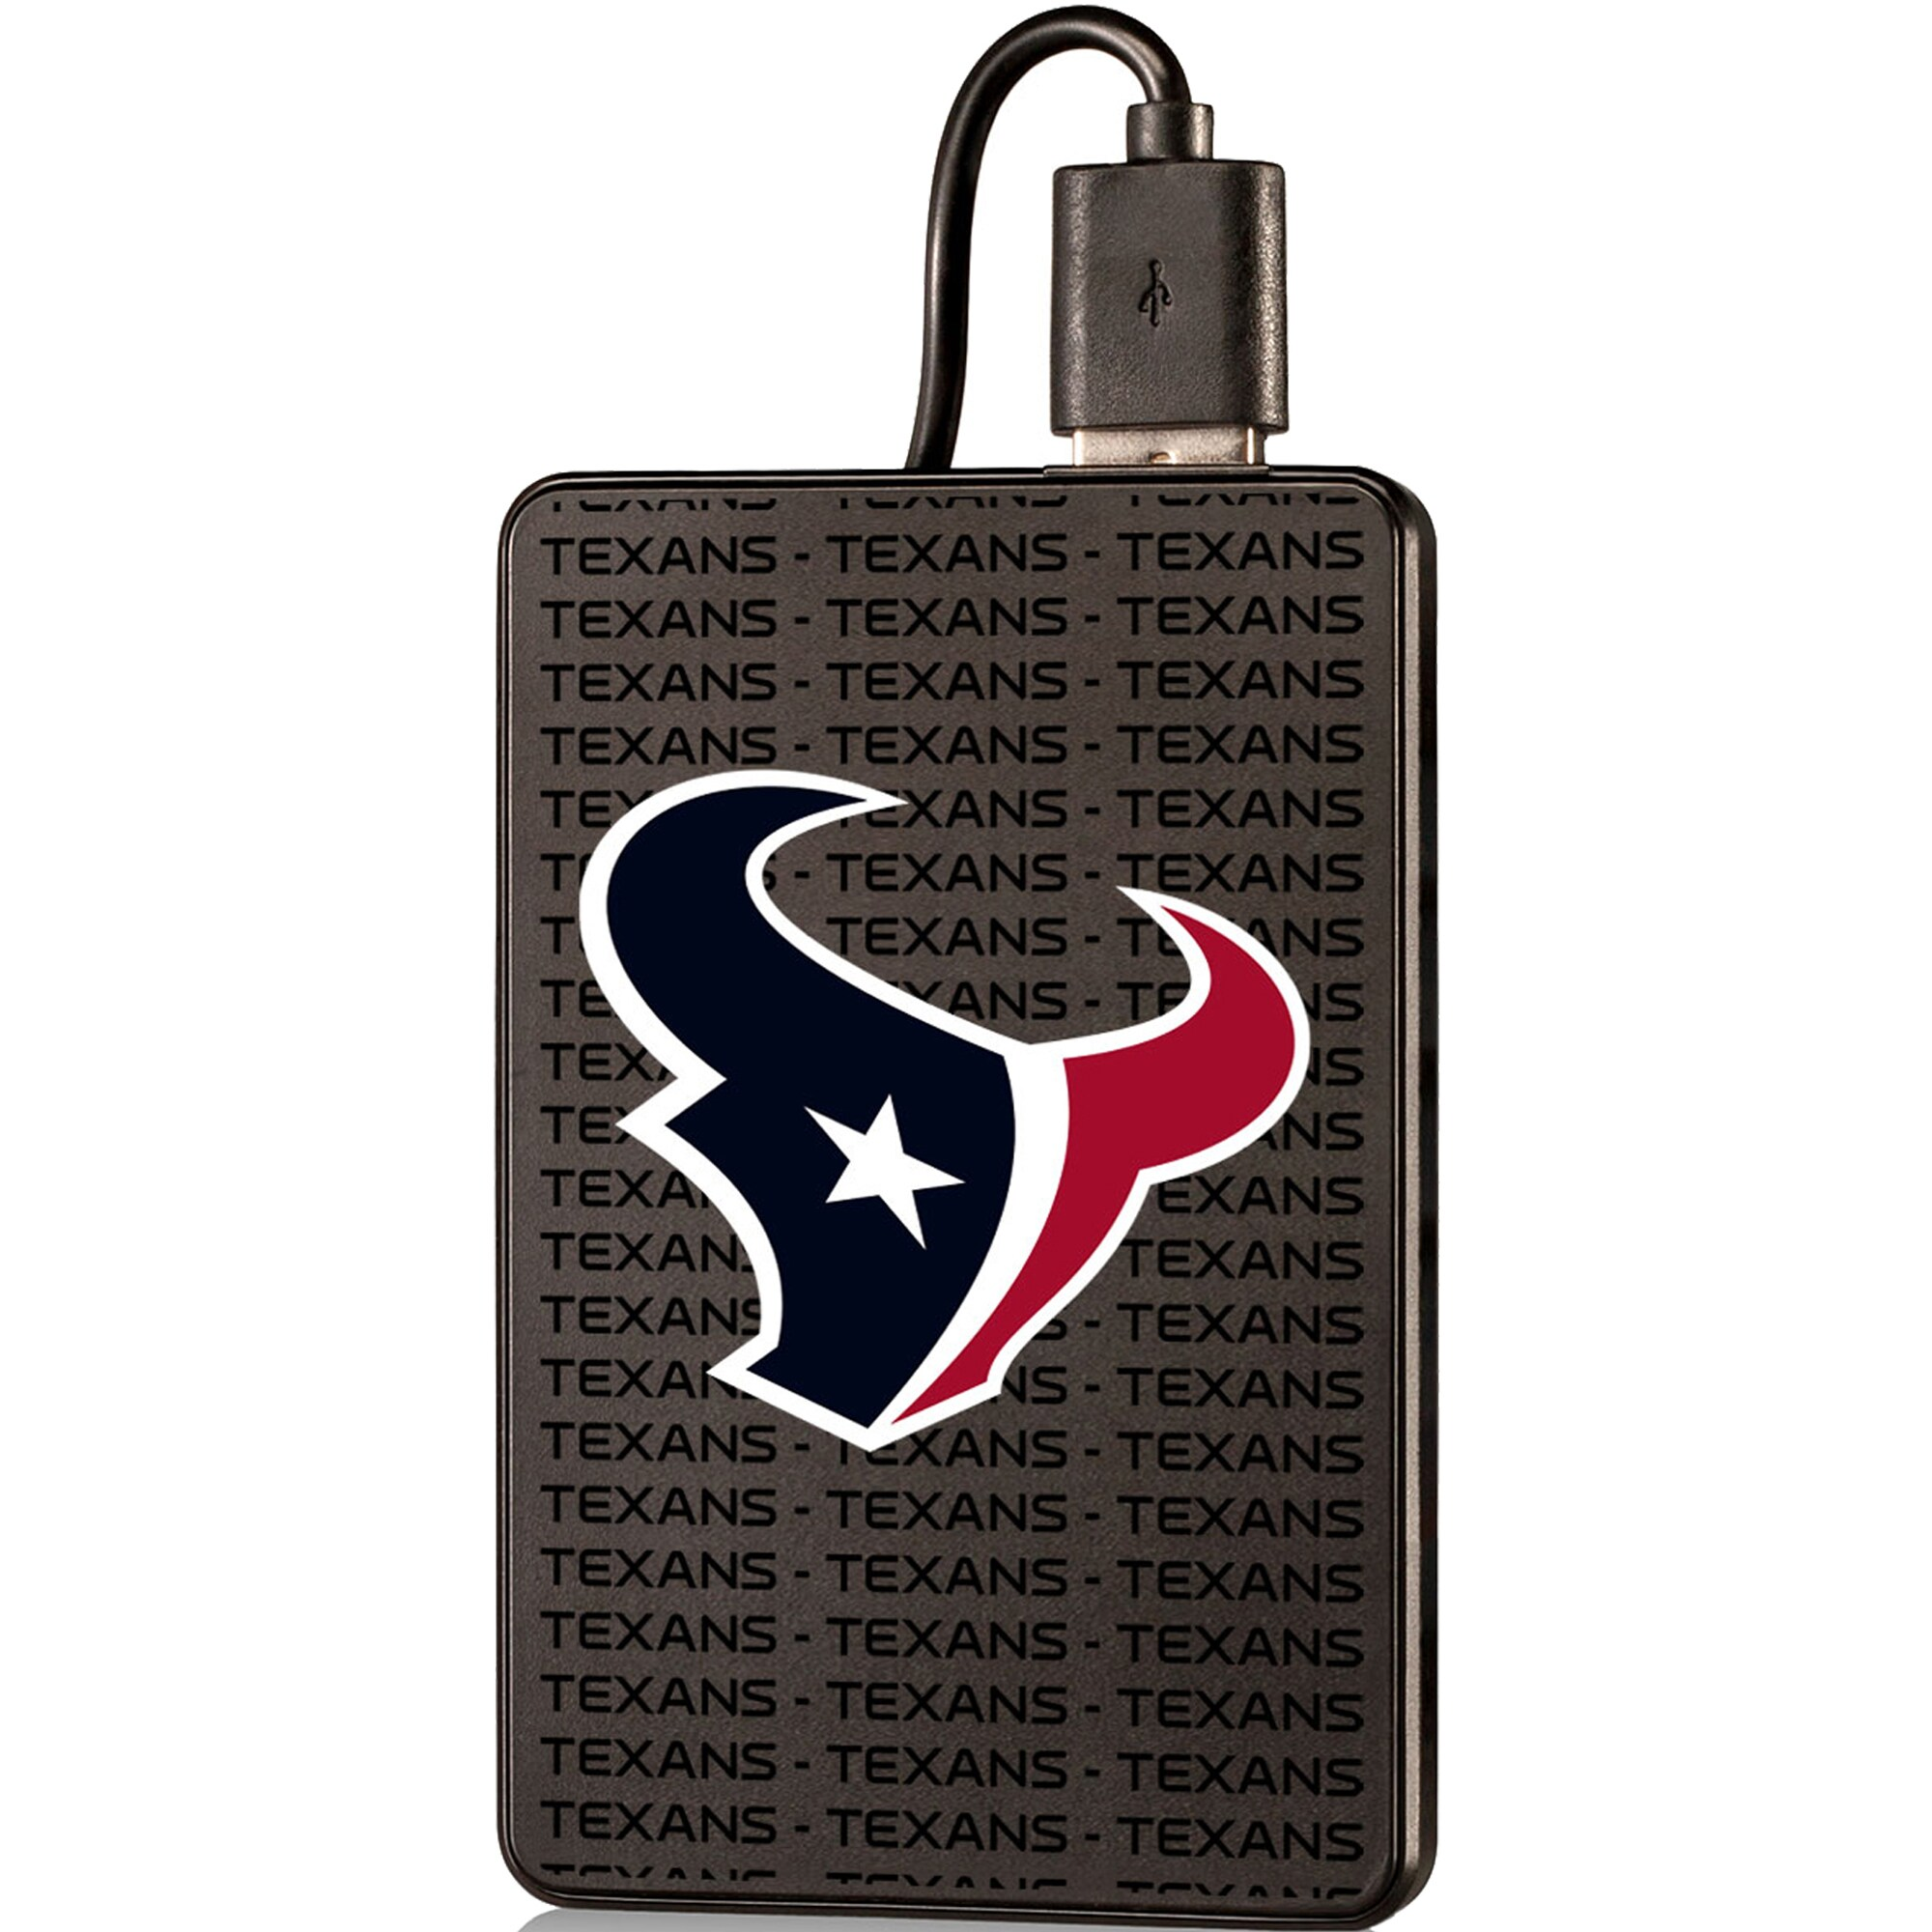 Houston Texans Text Backed 2000 mAh Credit Card Powerbank